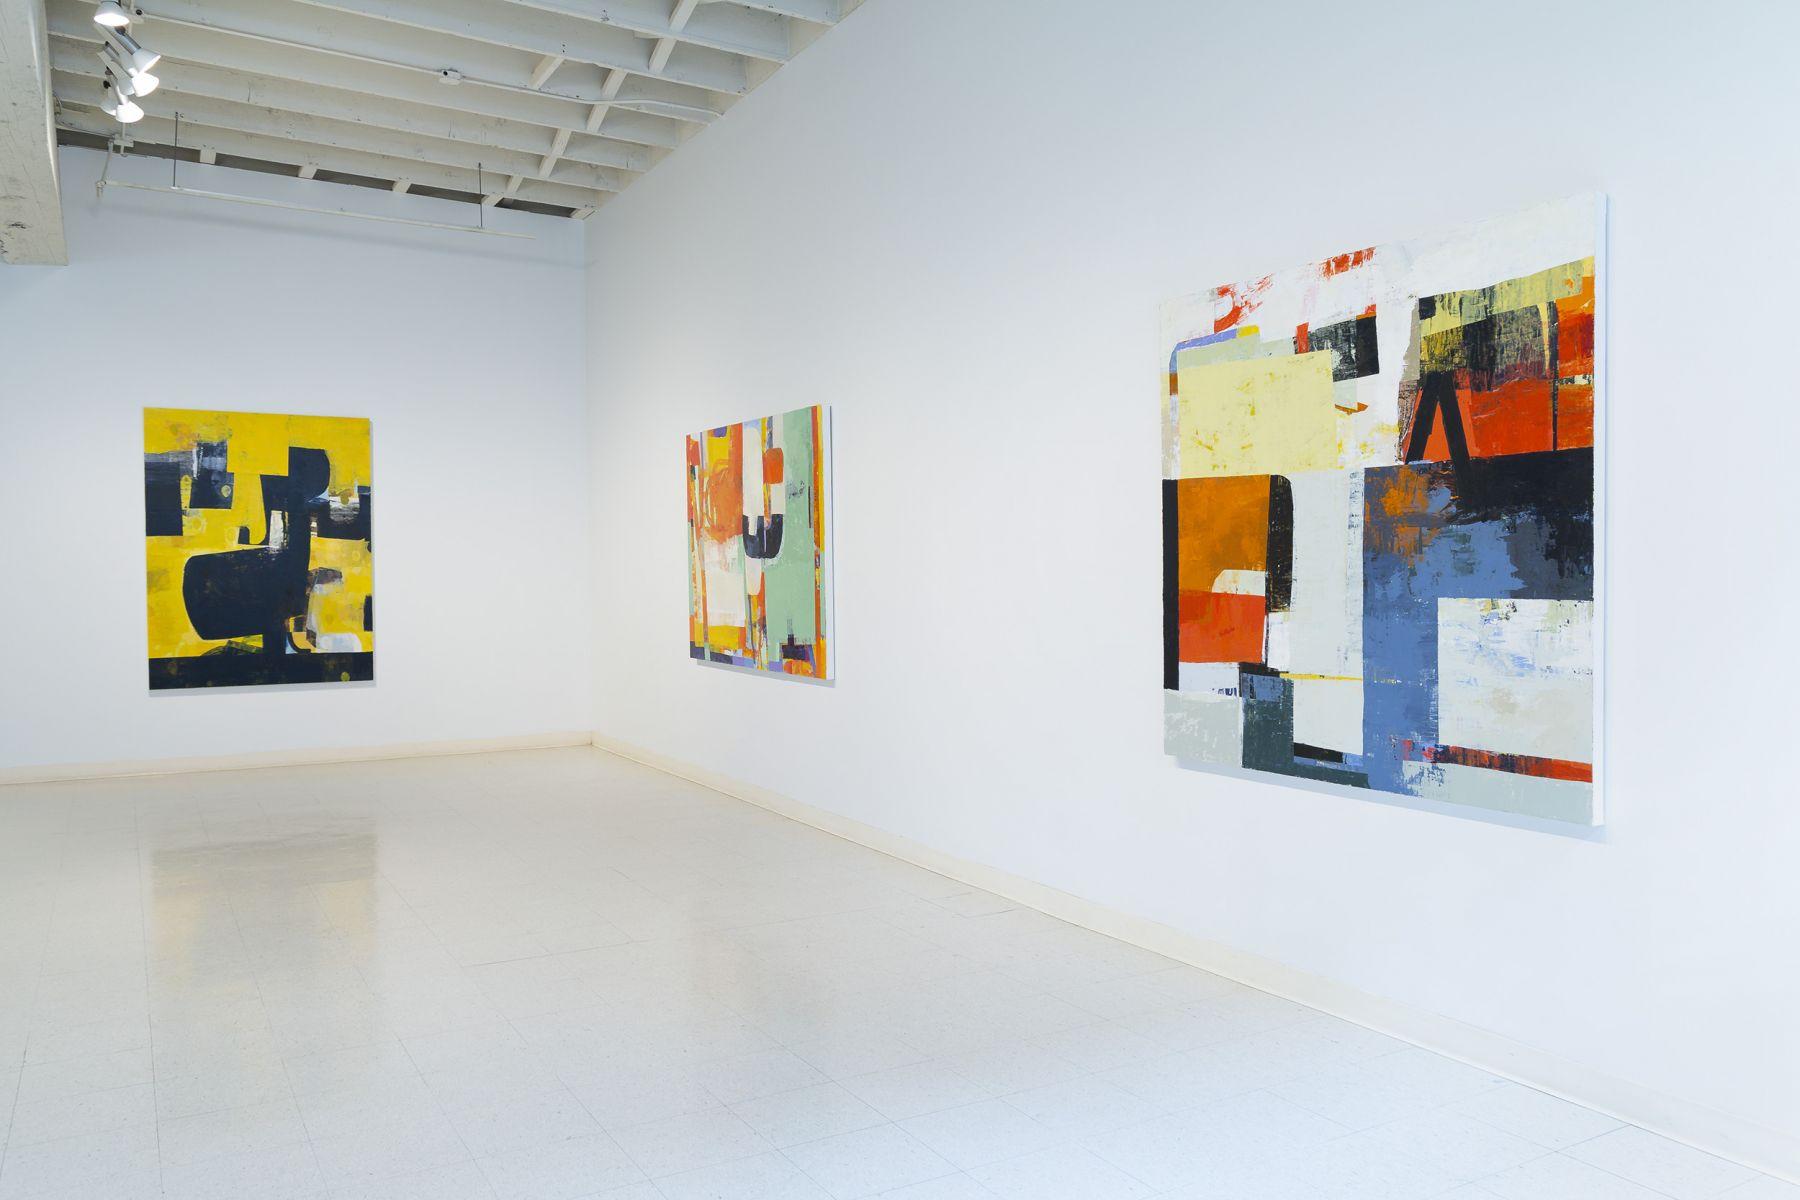 G. Lewis Clevenger - Minimis/Maximus - June 2019 - Installation View 05